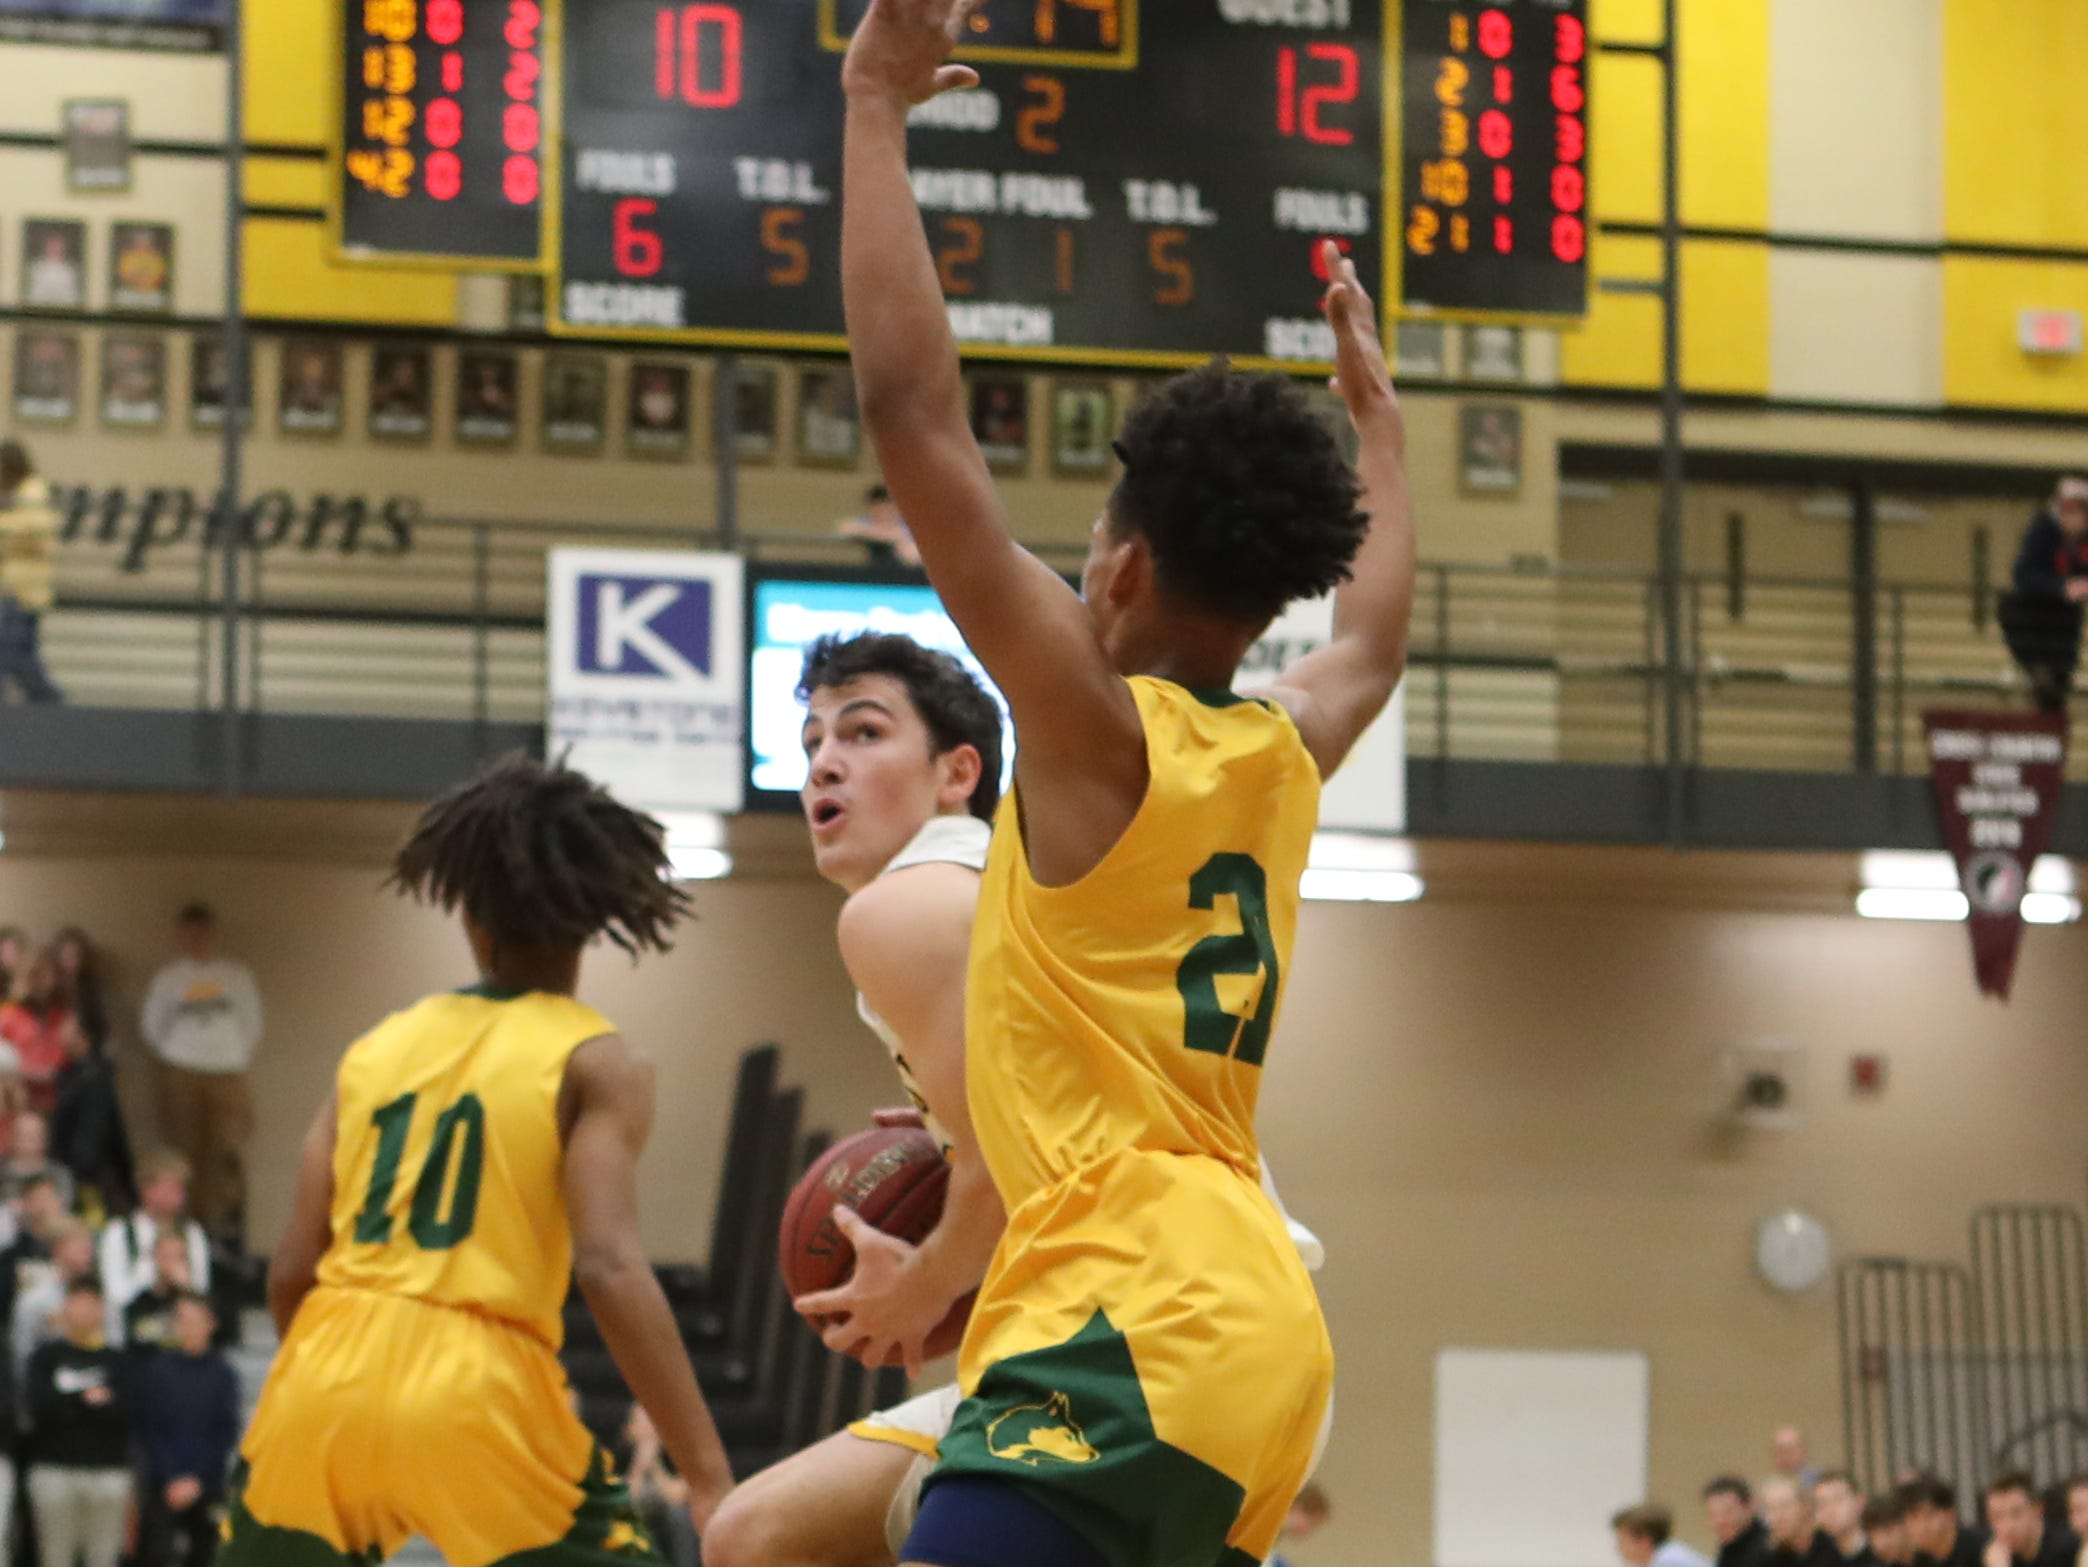 Hoover Huskies Jaden Loveless (21) defends the shot from Southeast Polk Rams Daniel Hackbarth (10) at Southeast Polk High School.